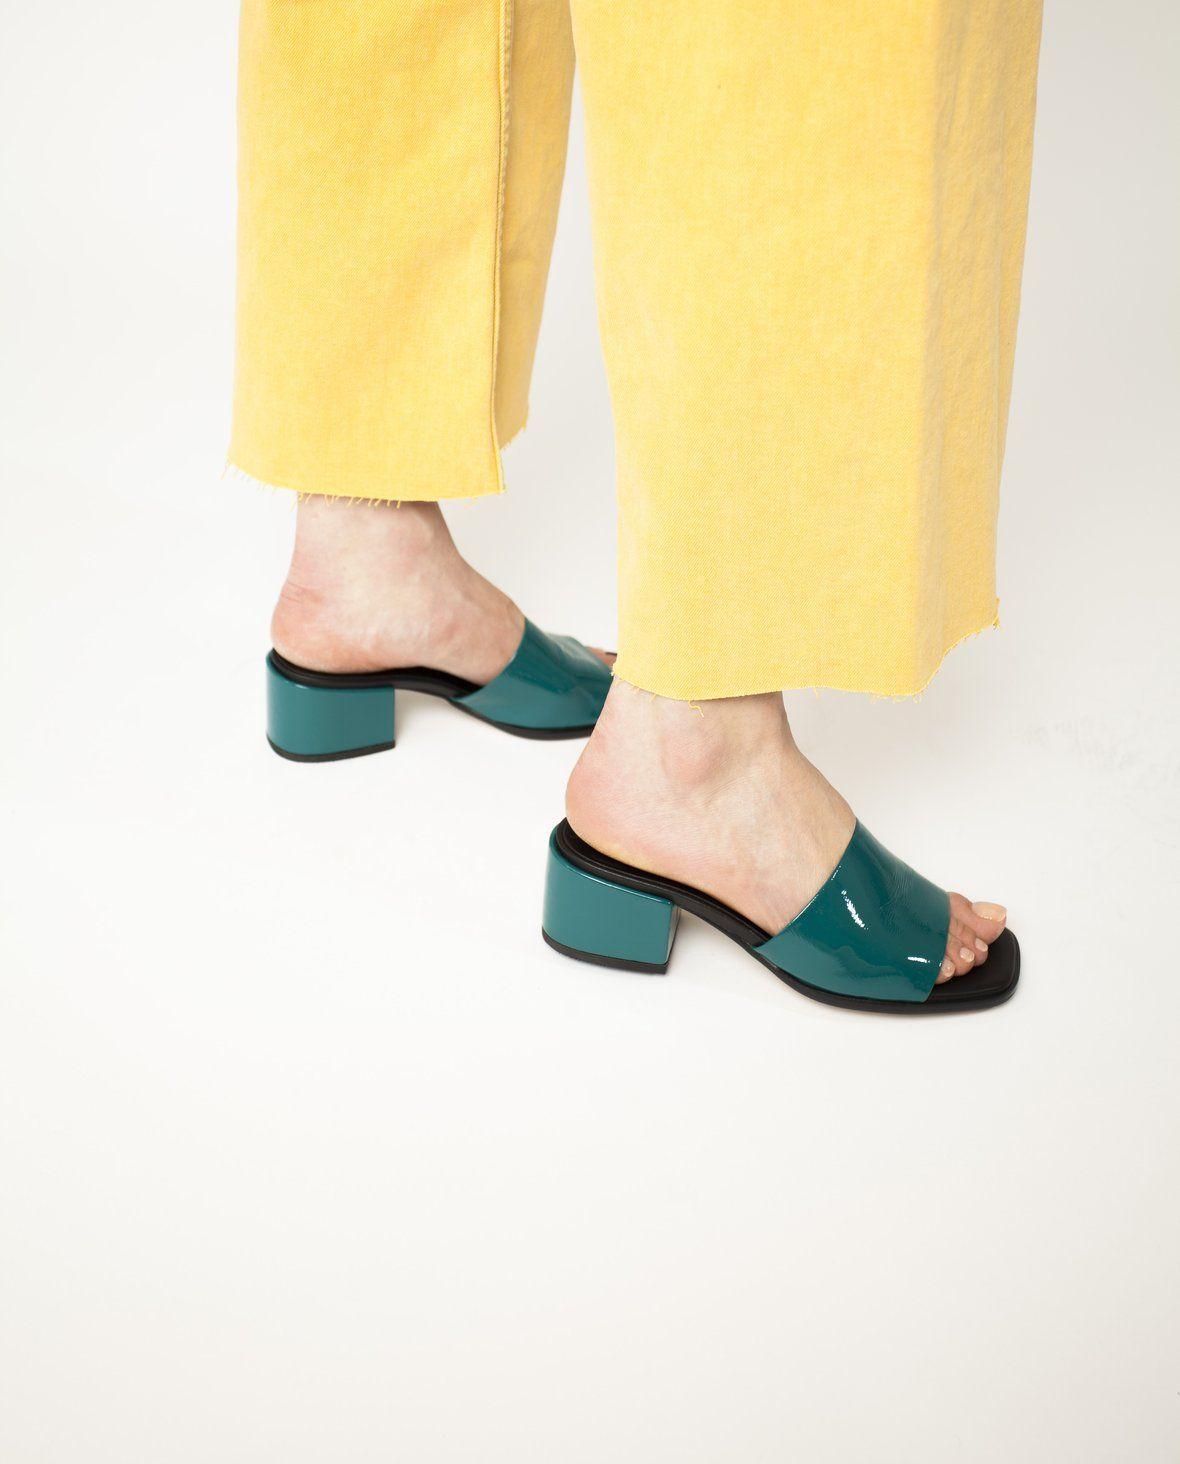 2 Baia Vista Vela Blue Patent Zomp Shoez In 2020 Leather Mules Patent Leather Heeled Mules